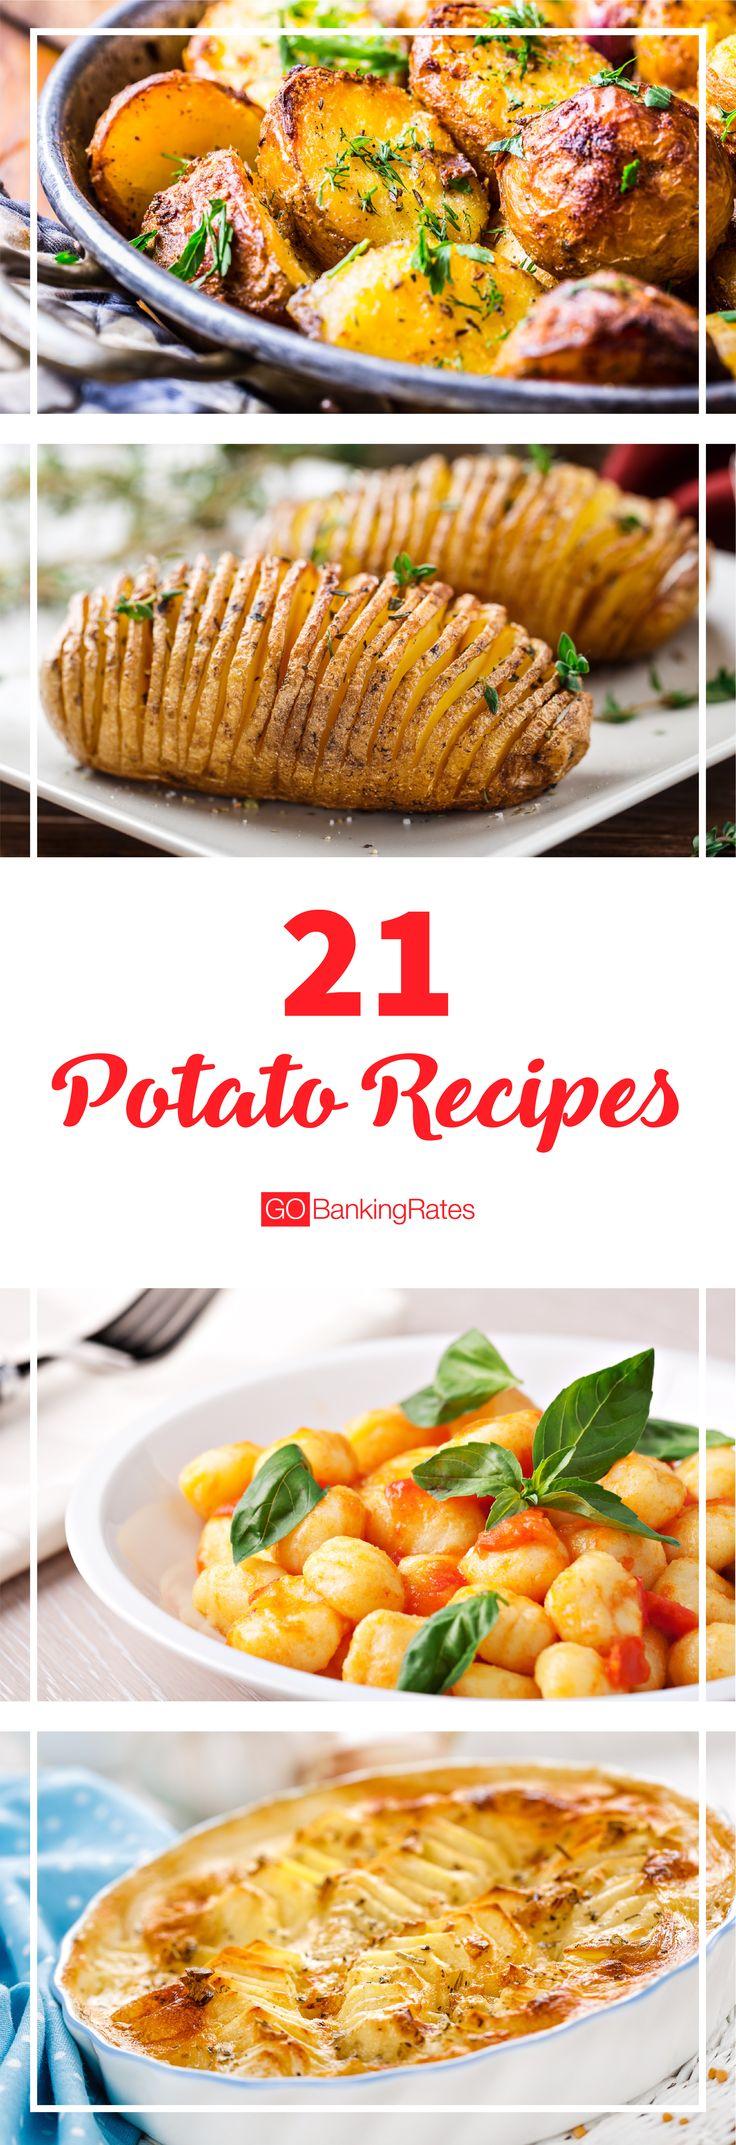 Click through to learn 21 new potato recipes....